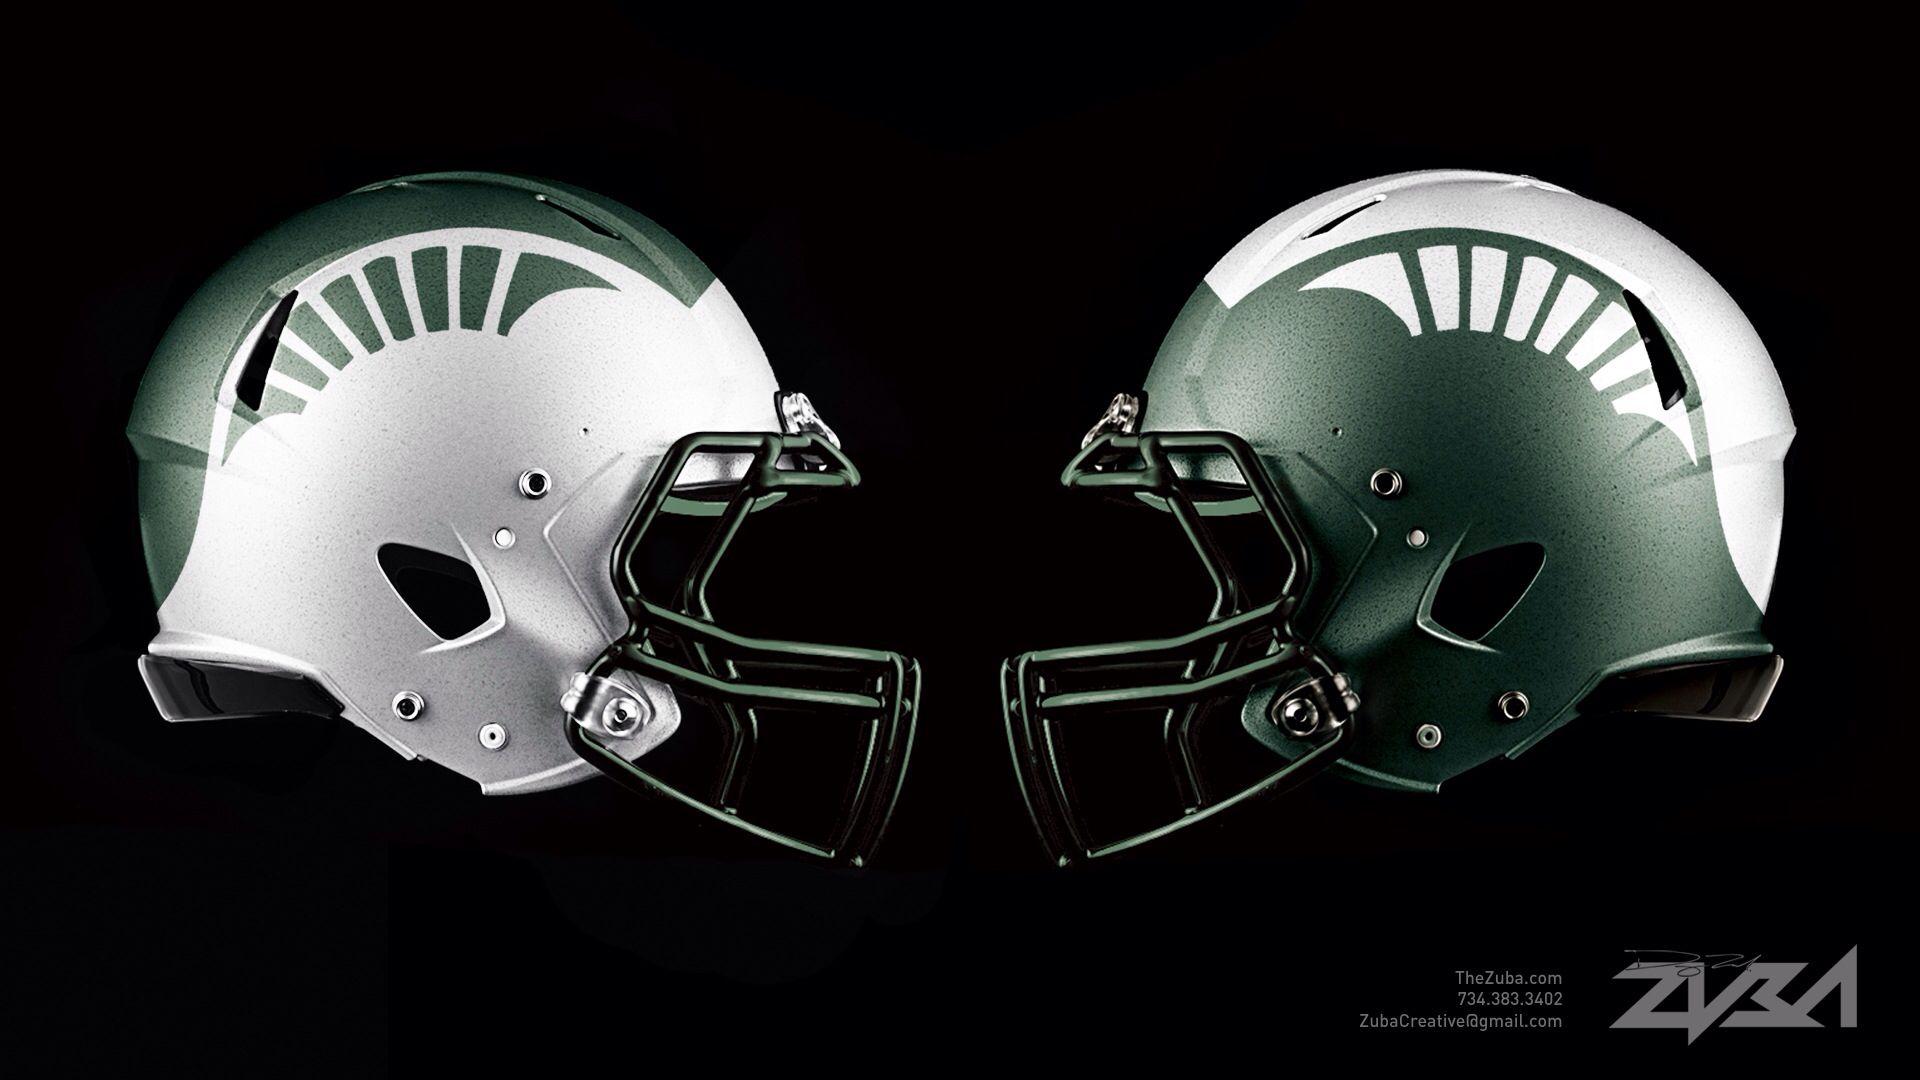 Porn Film Sports Gear msu football helmet concept | college football helmets